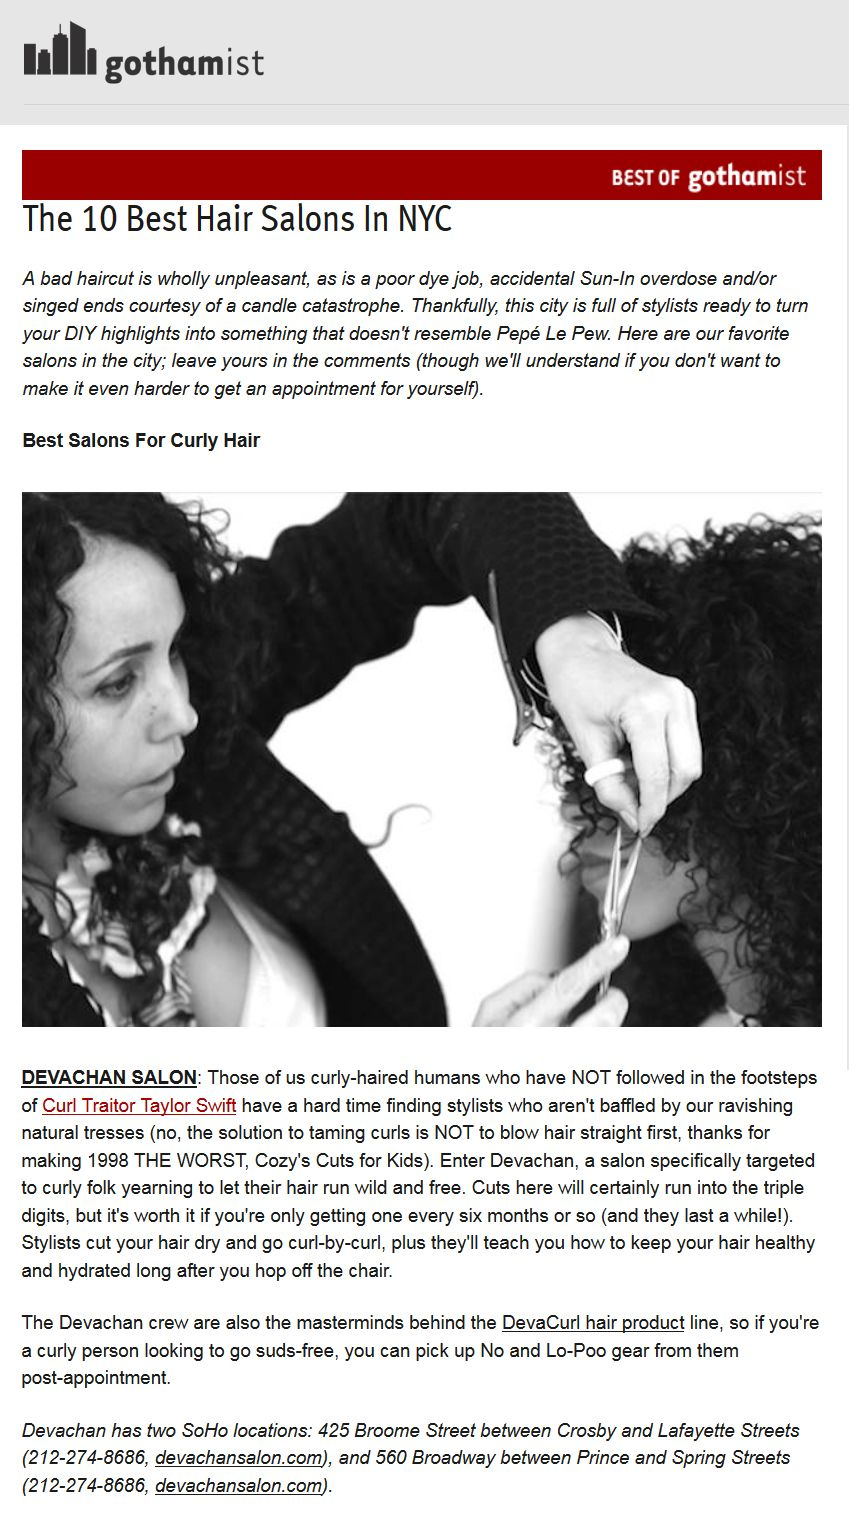 Gothamist The 10 Best Hair Salons In Nyc Featuring Devachan Salon Best Hair Salon Nyc Hair Salon Curly Hair Salon